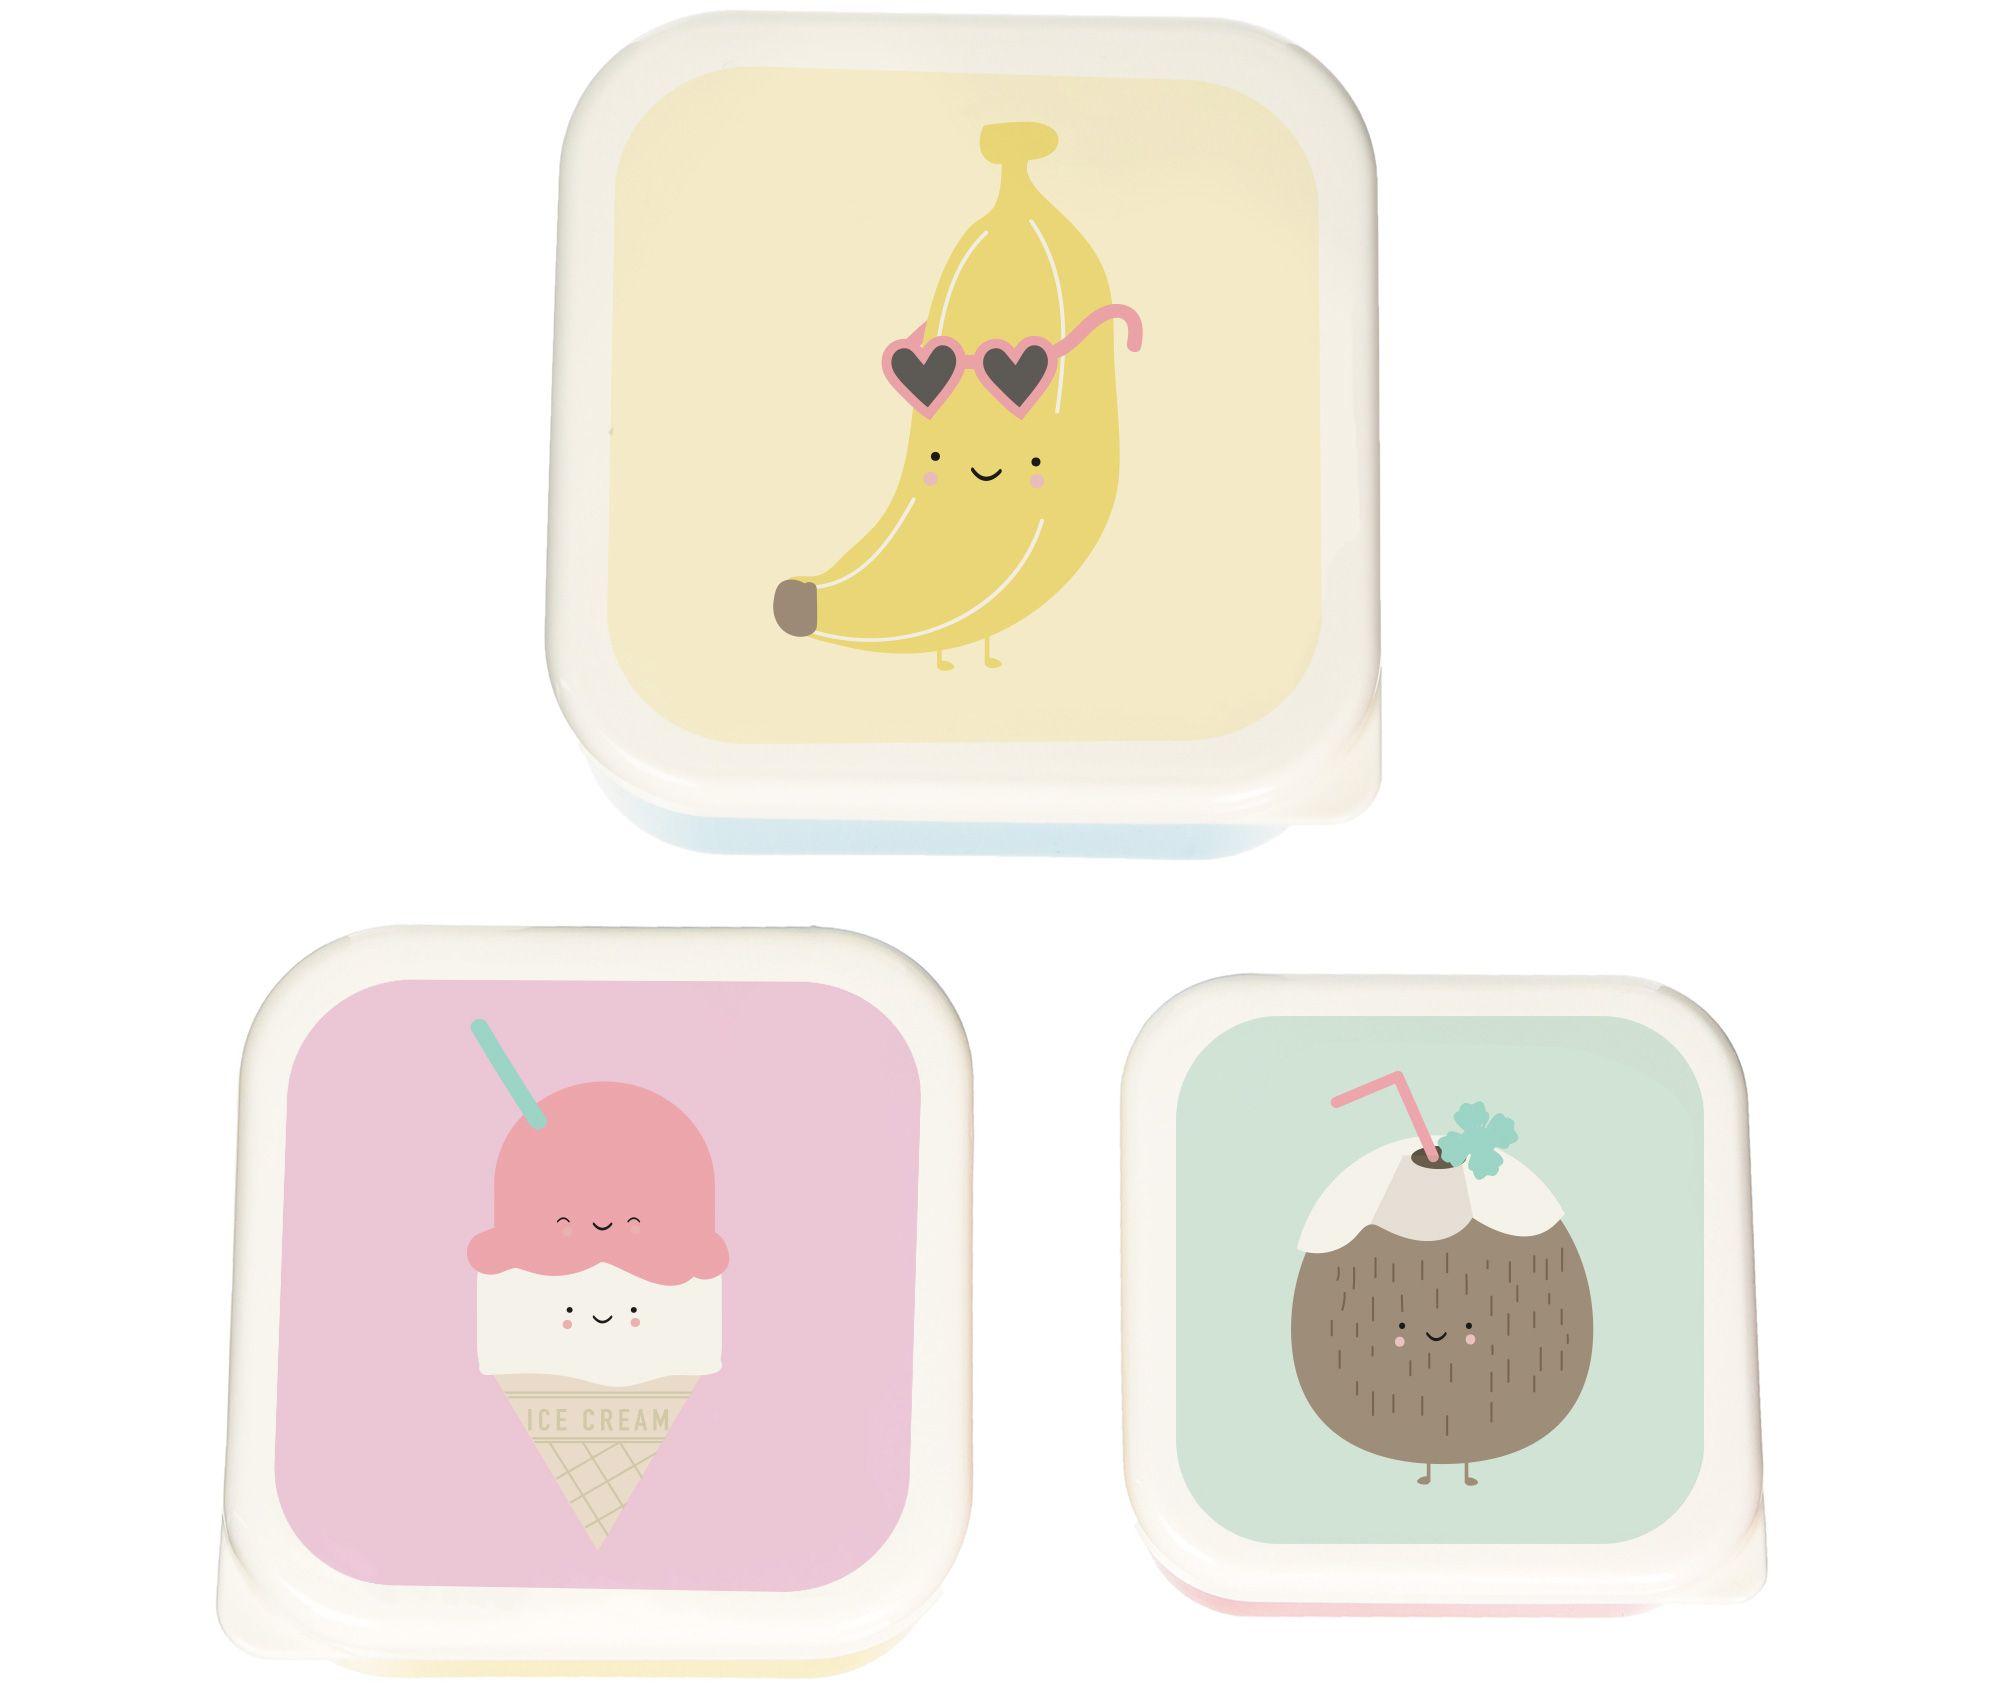 Afbeelding 3 snackdozen – Banana